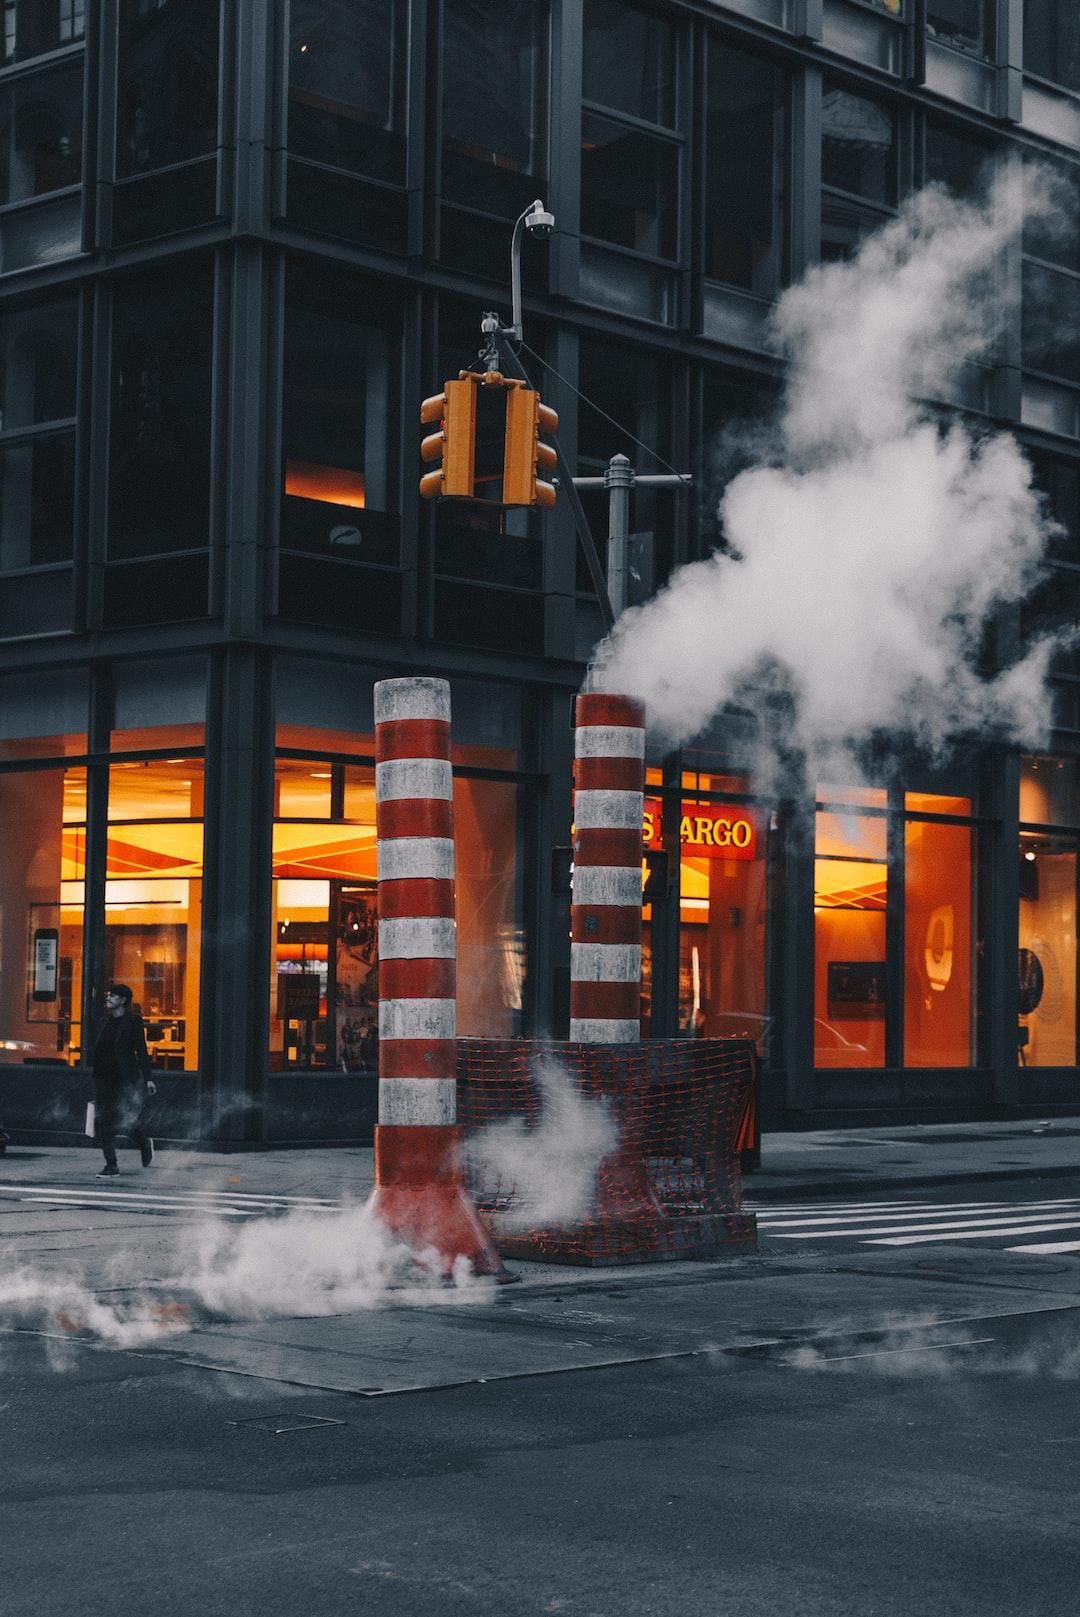 Commercial demolition tips